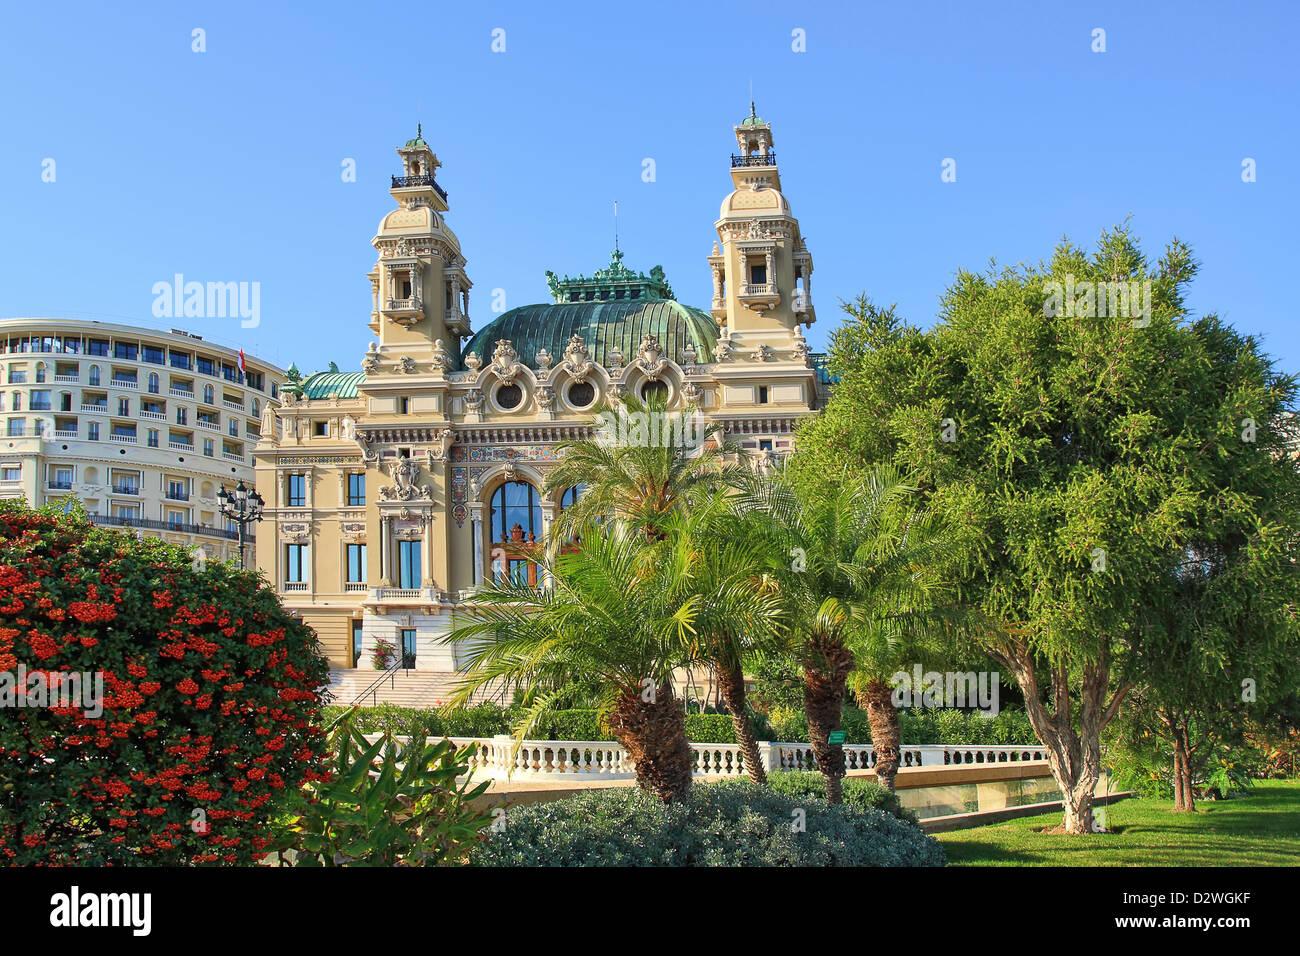 Facade of famous Opera de Monte-Carlo (Salle Garnier) as part of Monte Carlo Casino in Monaco. - Stock Image